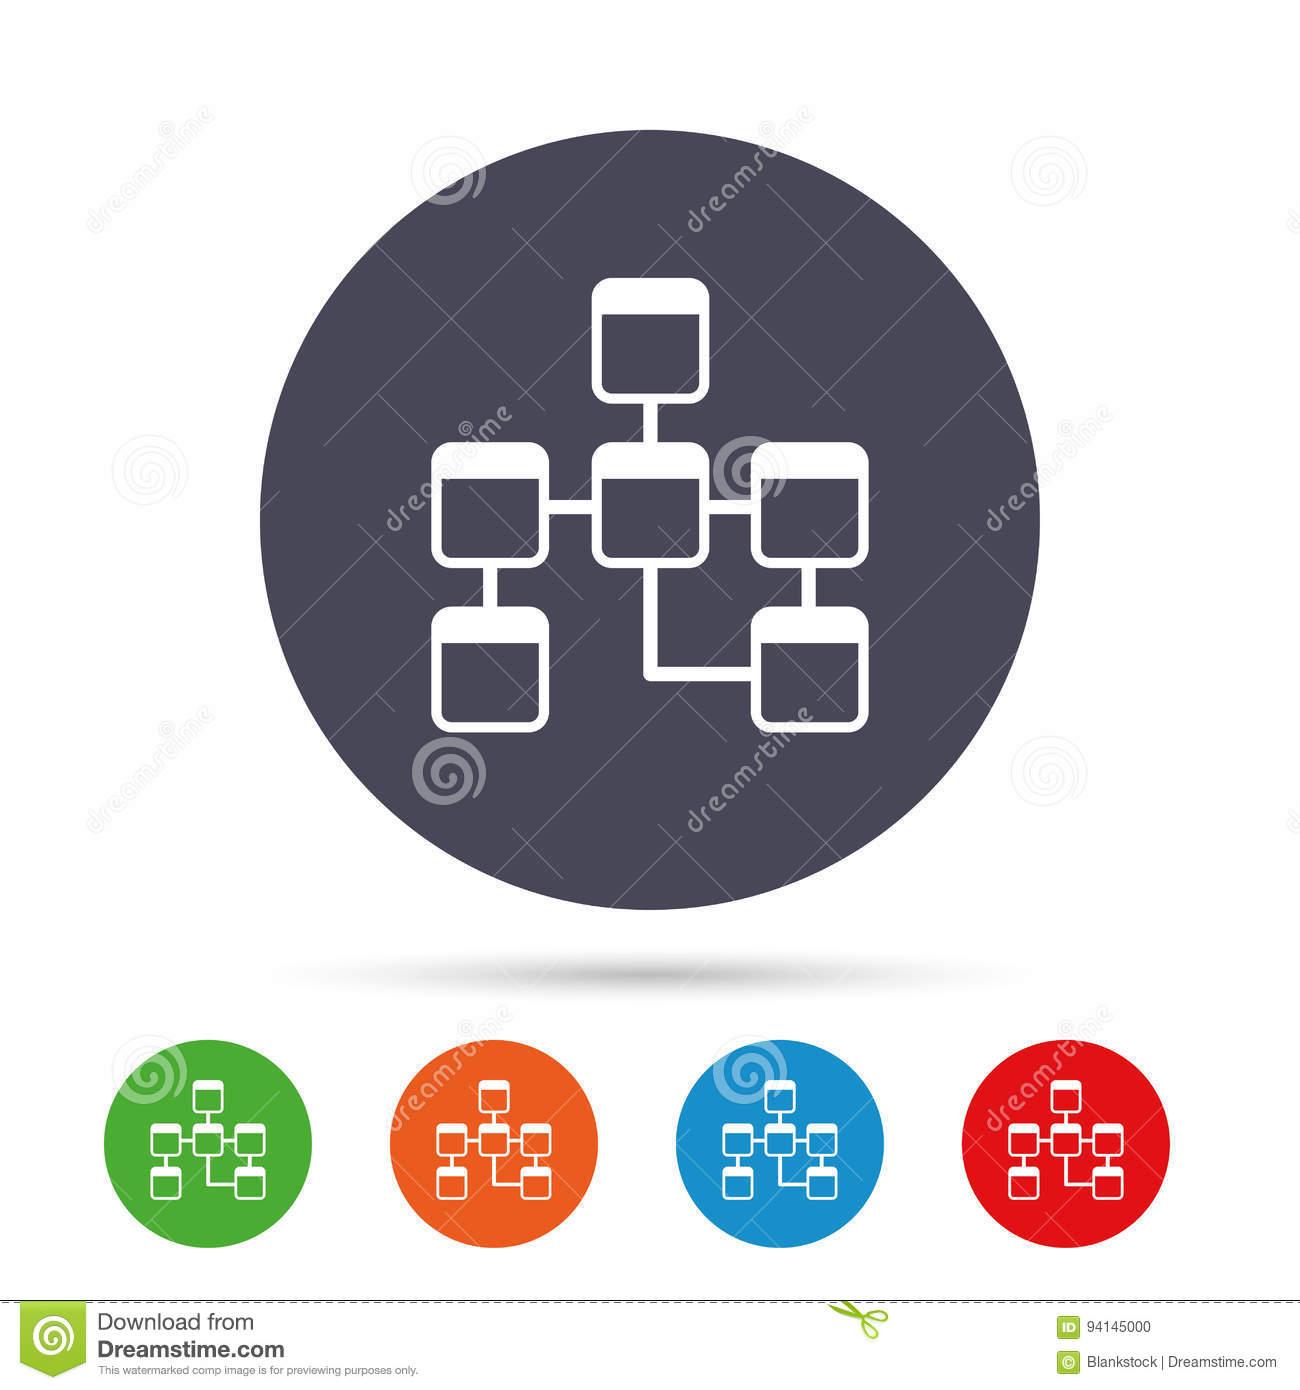 Database Sign Icon. Relational Database Schema. Stock Vector regarding Database Schema Symbols